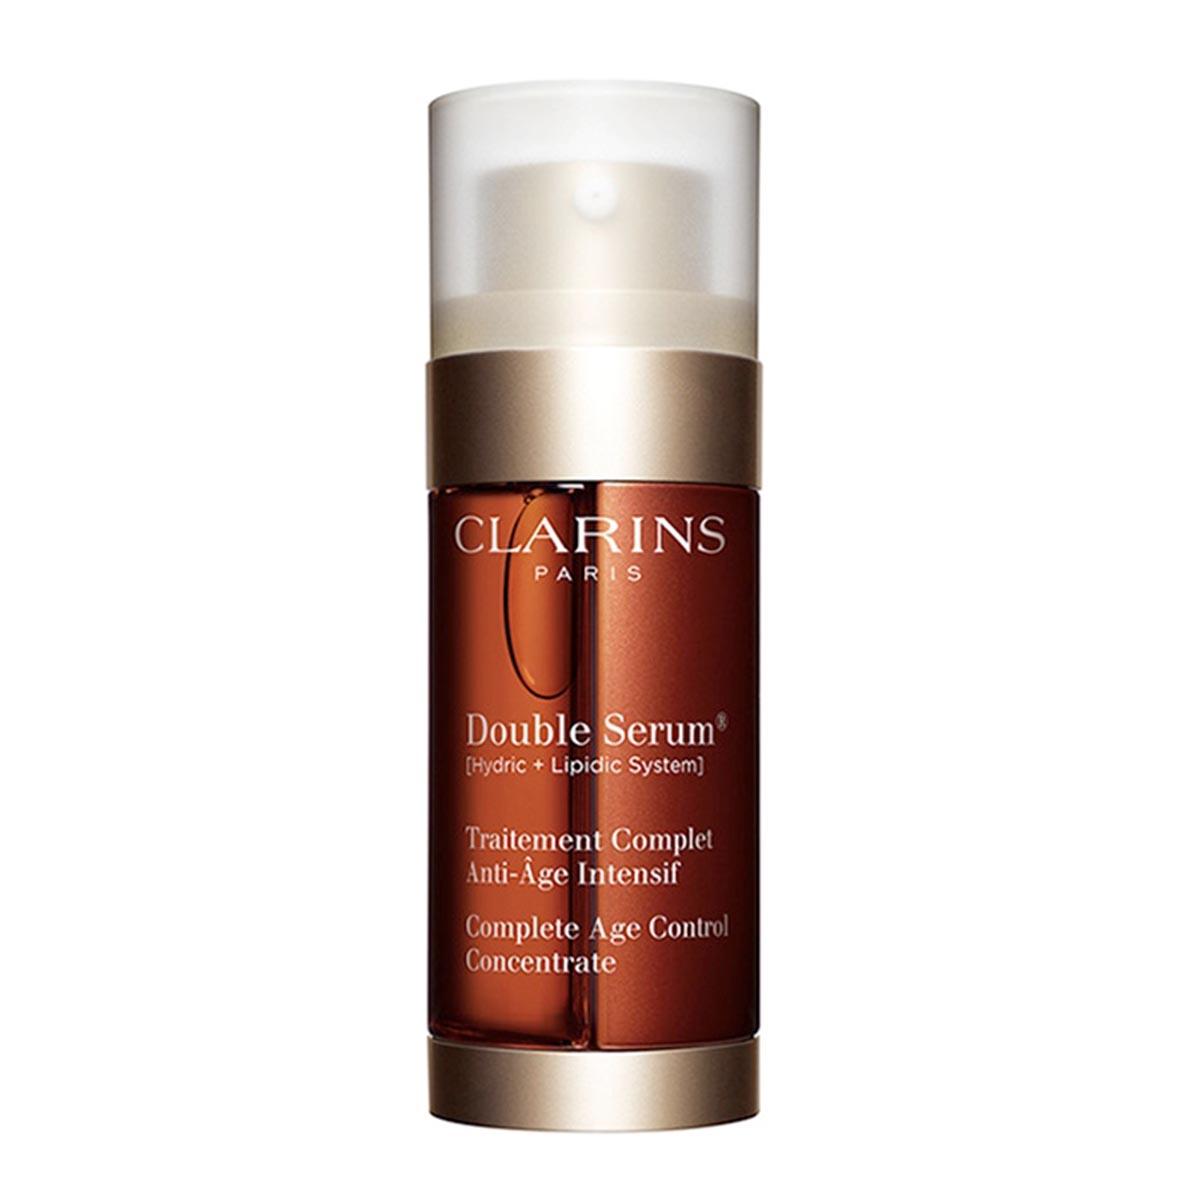 Clarins double serum anti age intensif 50ml